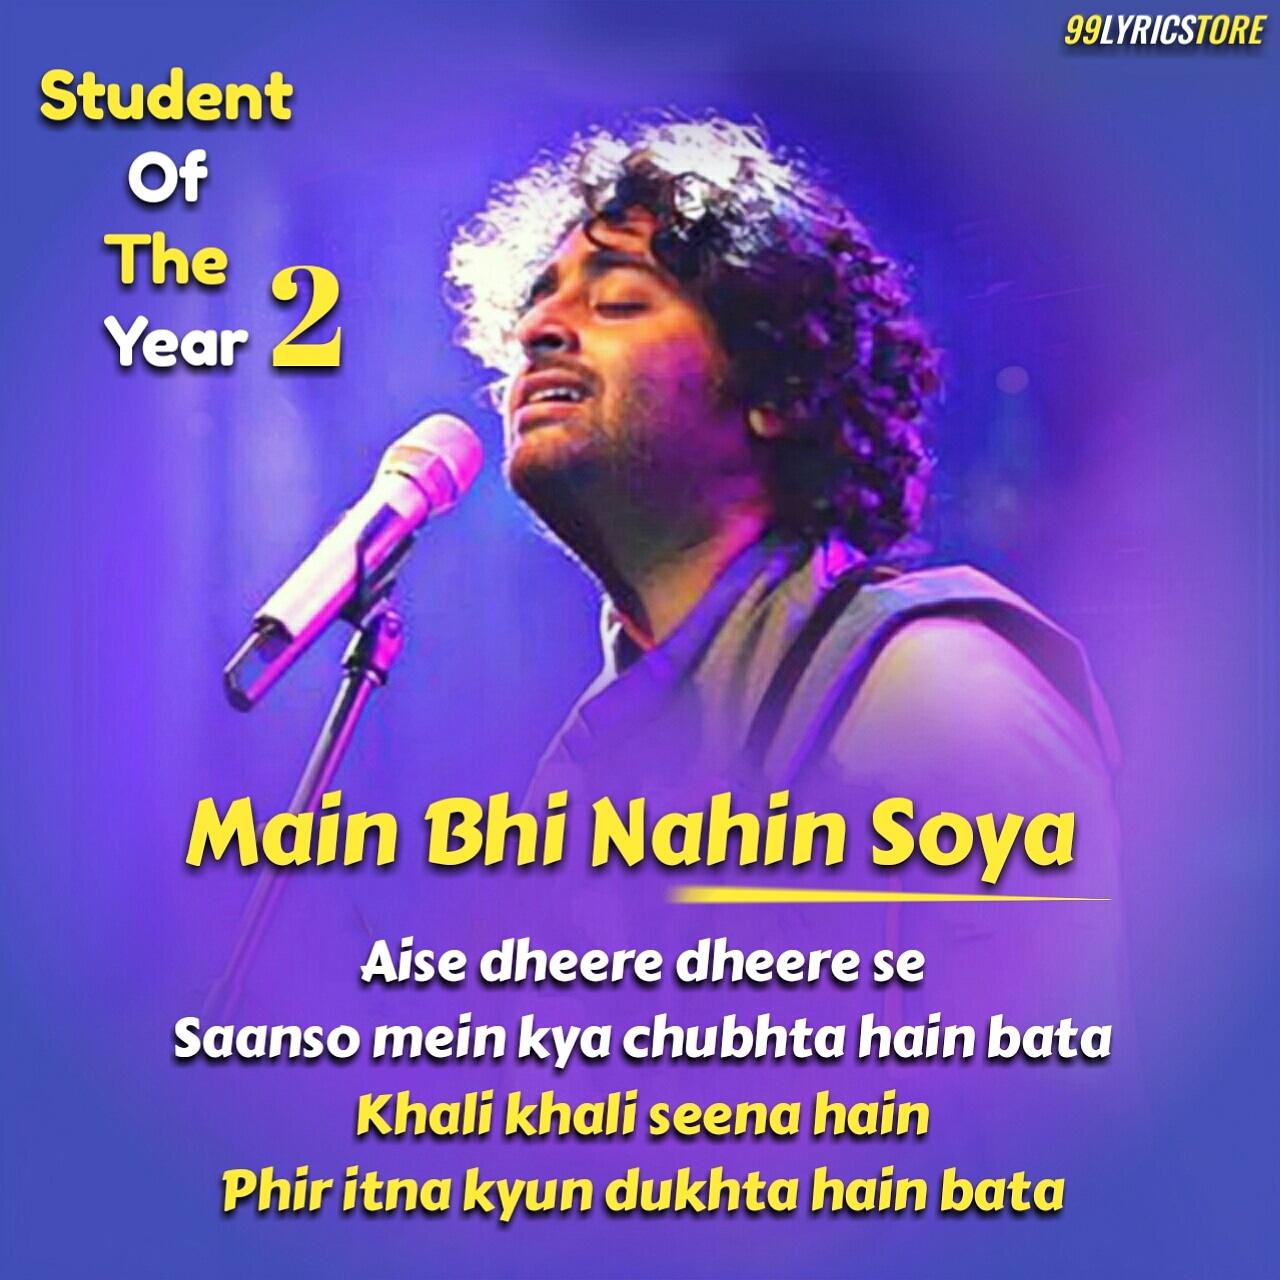 Main Bhi Nahin Soya Lyrics Sung by Arijit Singh from movie student Of The Year 2